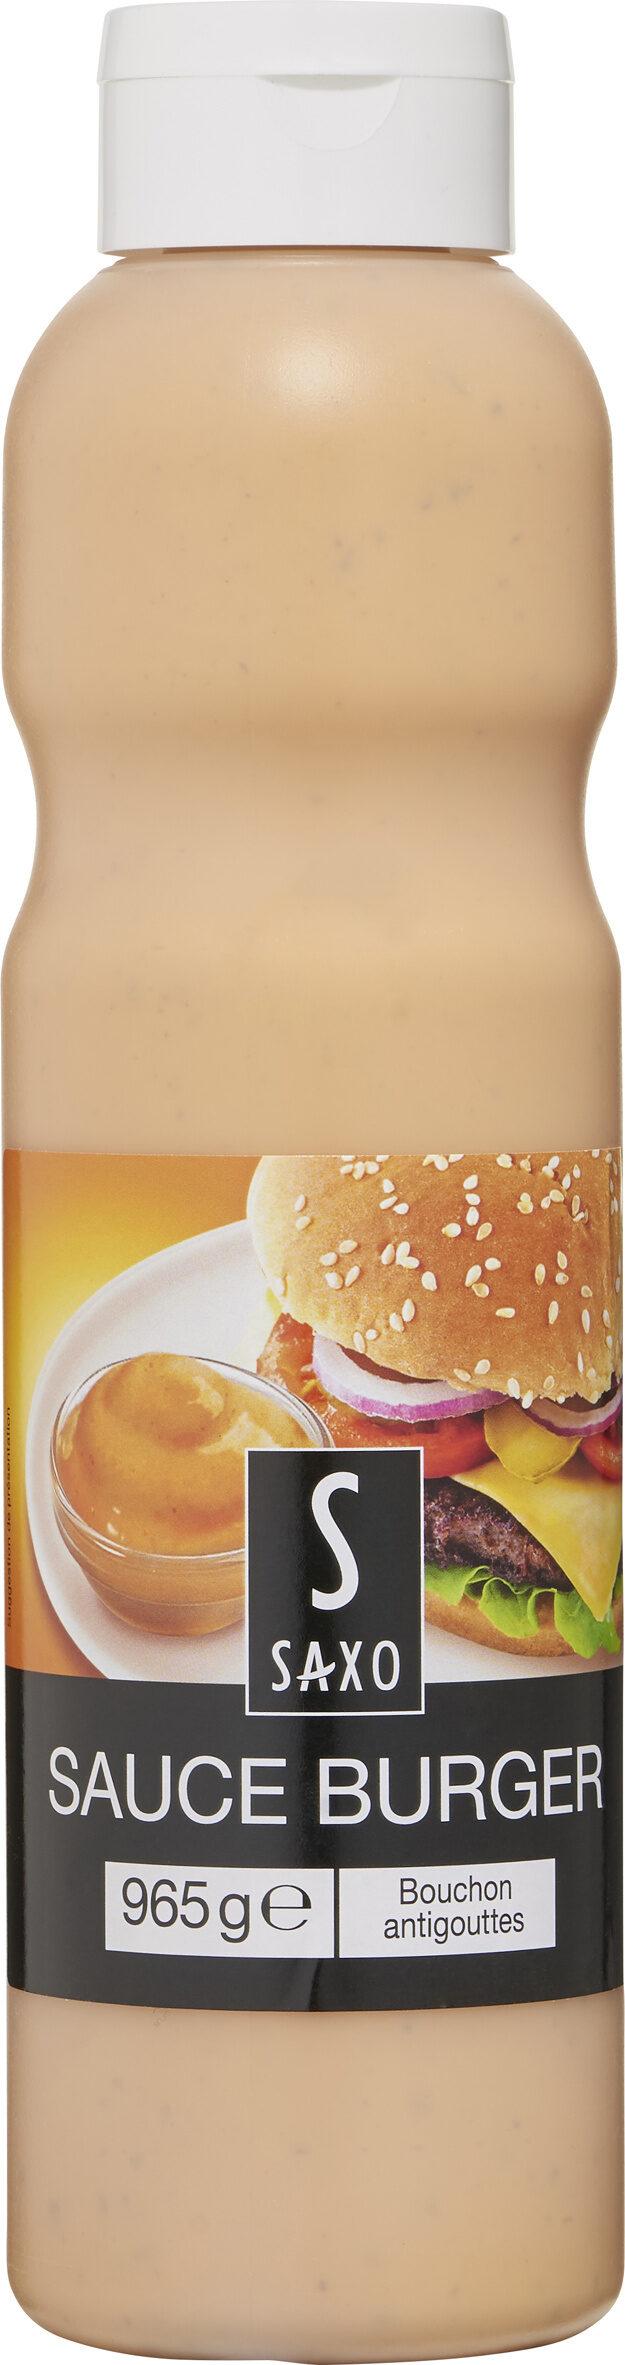 Sauce Hamburger. saxo - Prodotto - fr